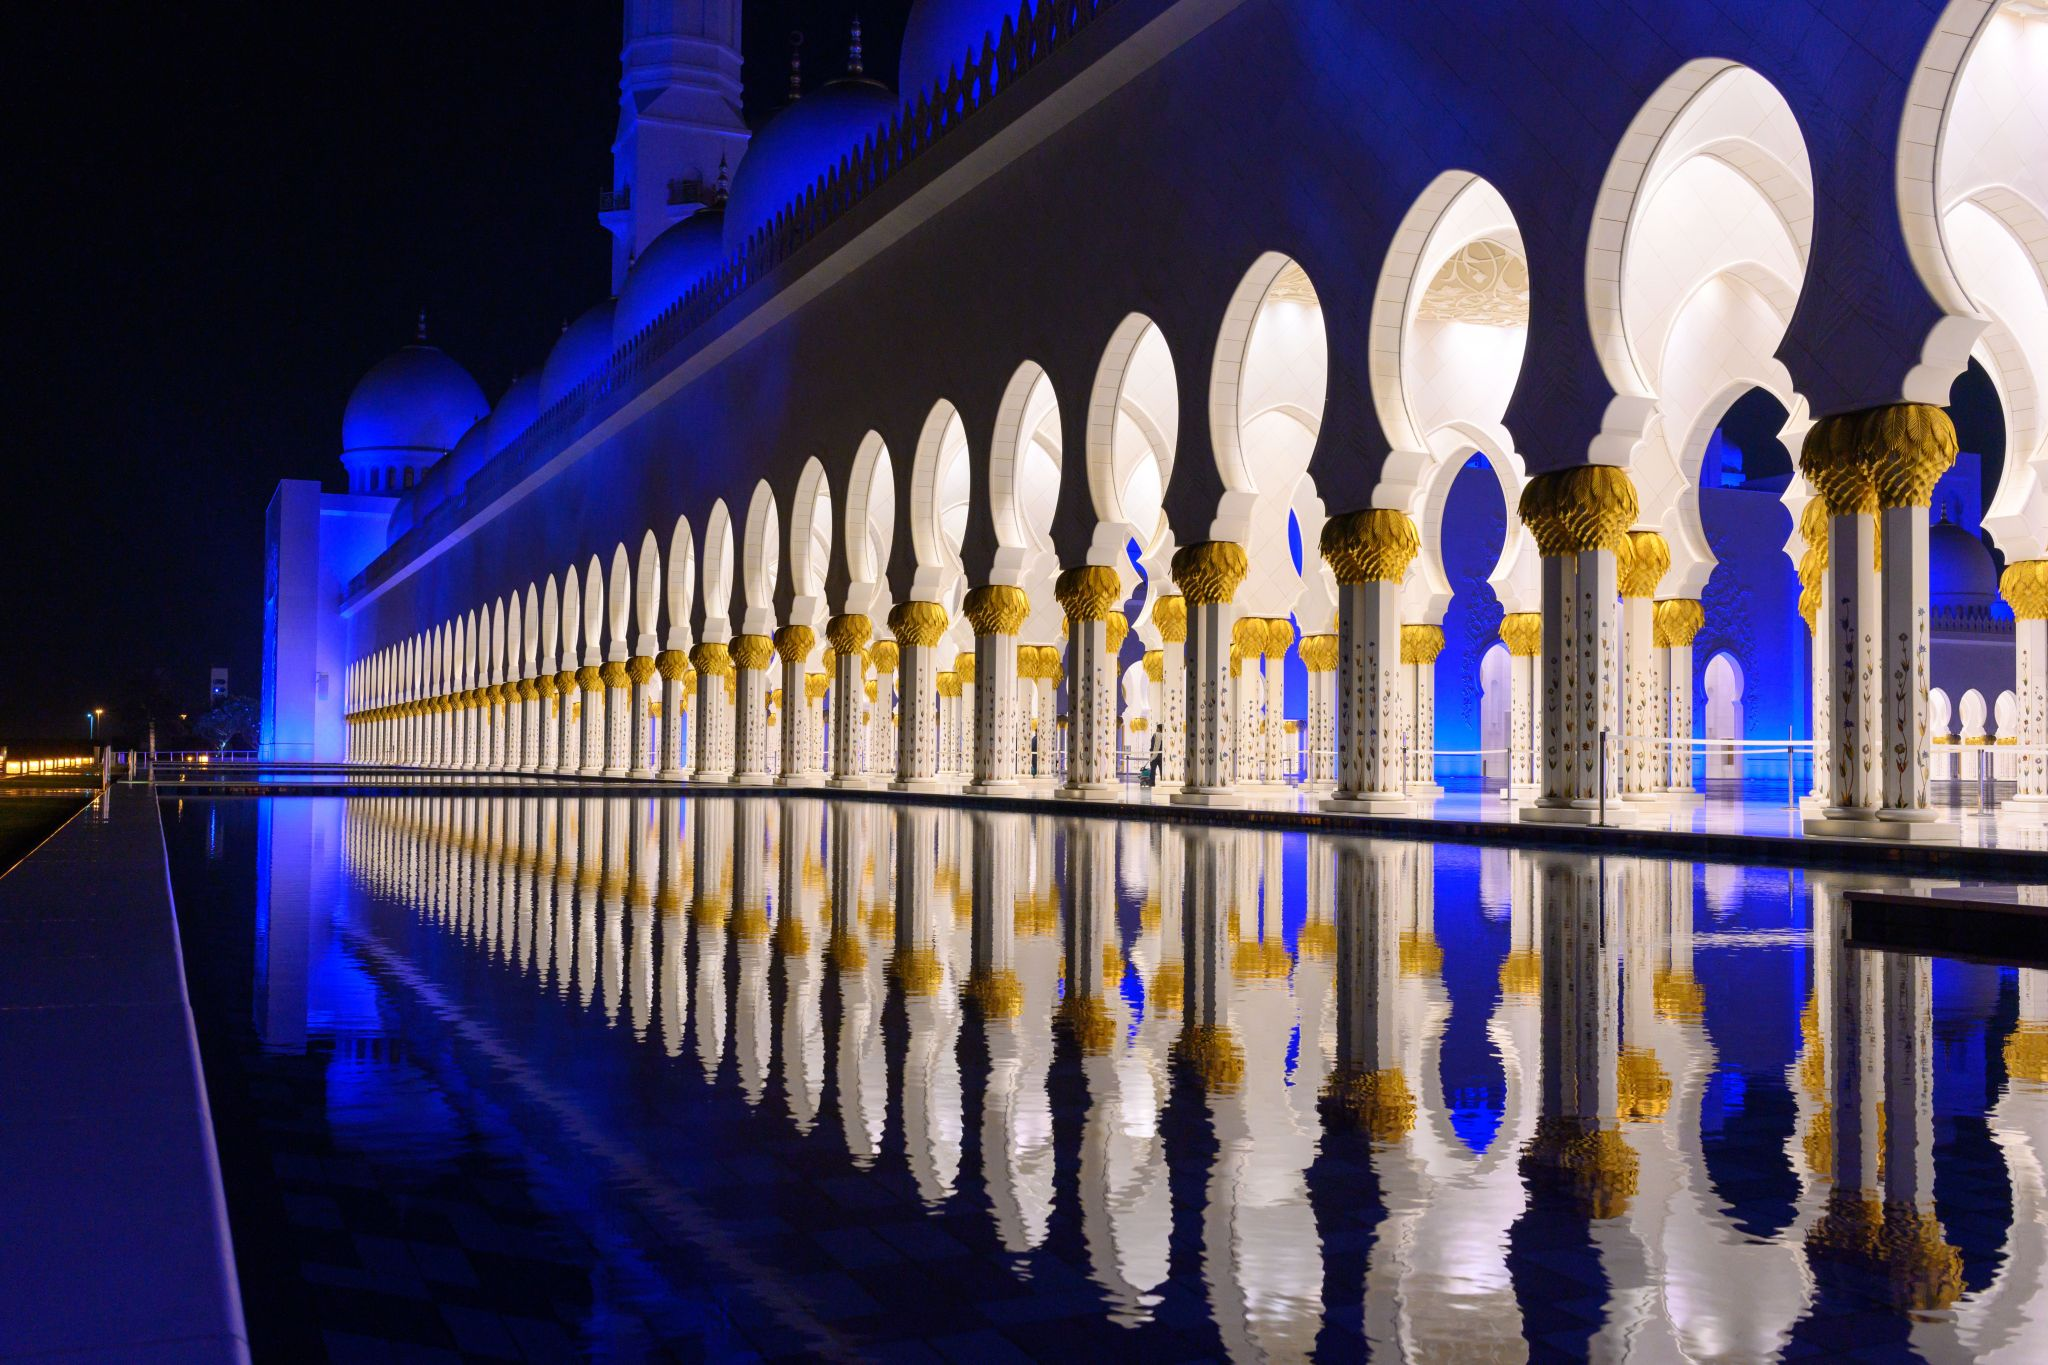 Sheikh Zayed Grand Mosque, United Arab Emirates